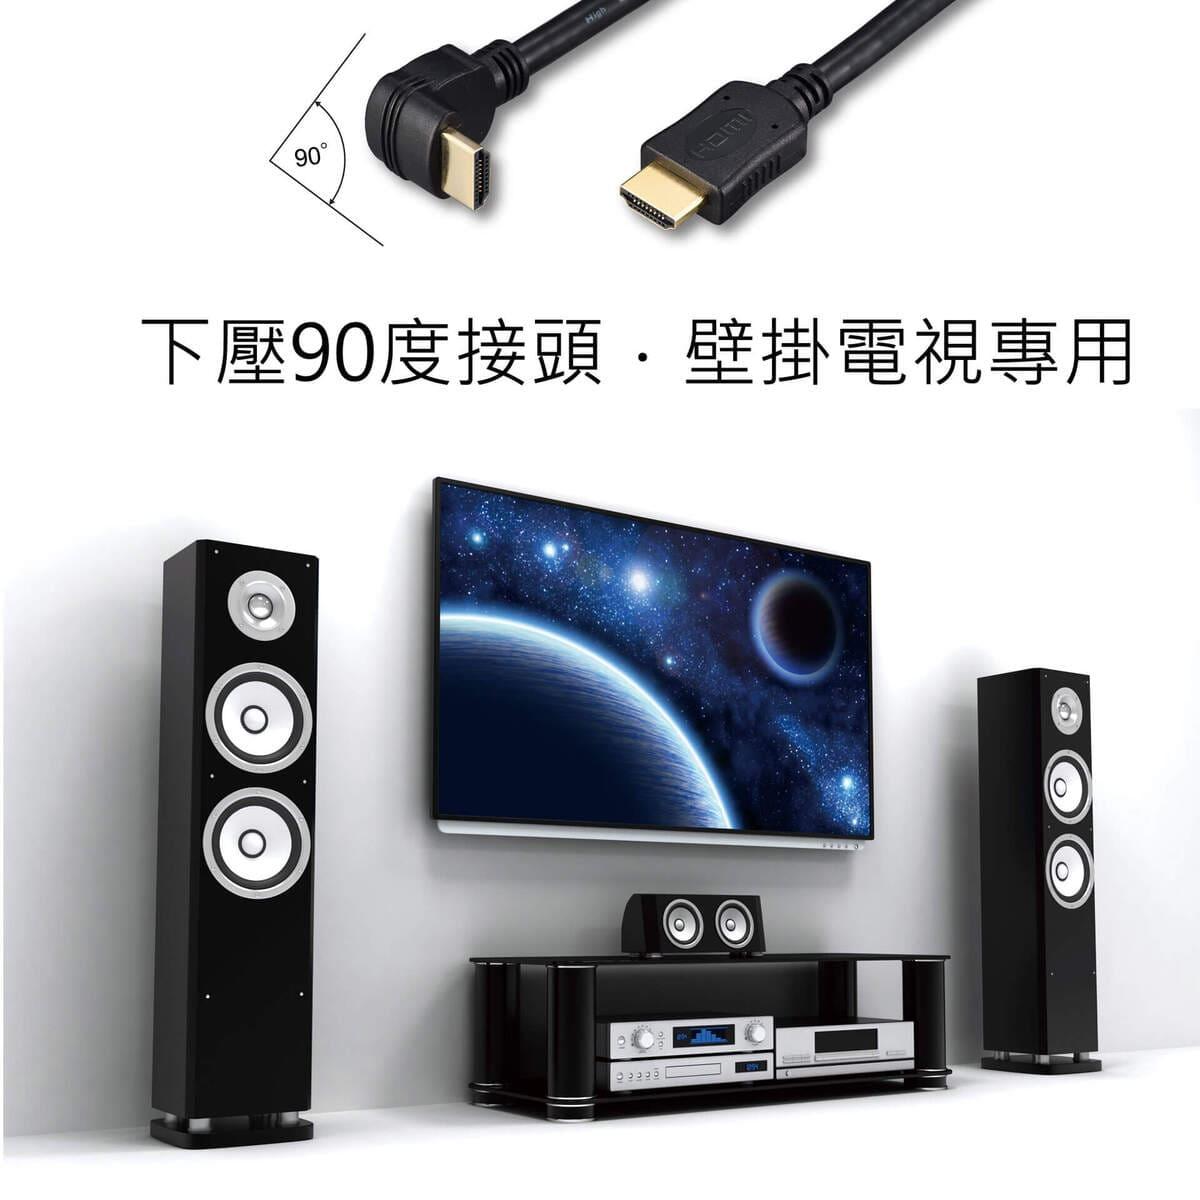 proimages/product/pro-02/pro02-001/HD-3V/HD-3V-4.jpg